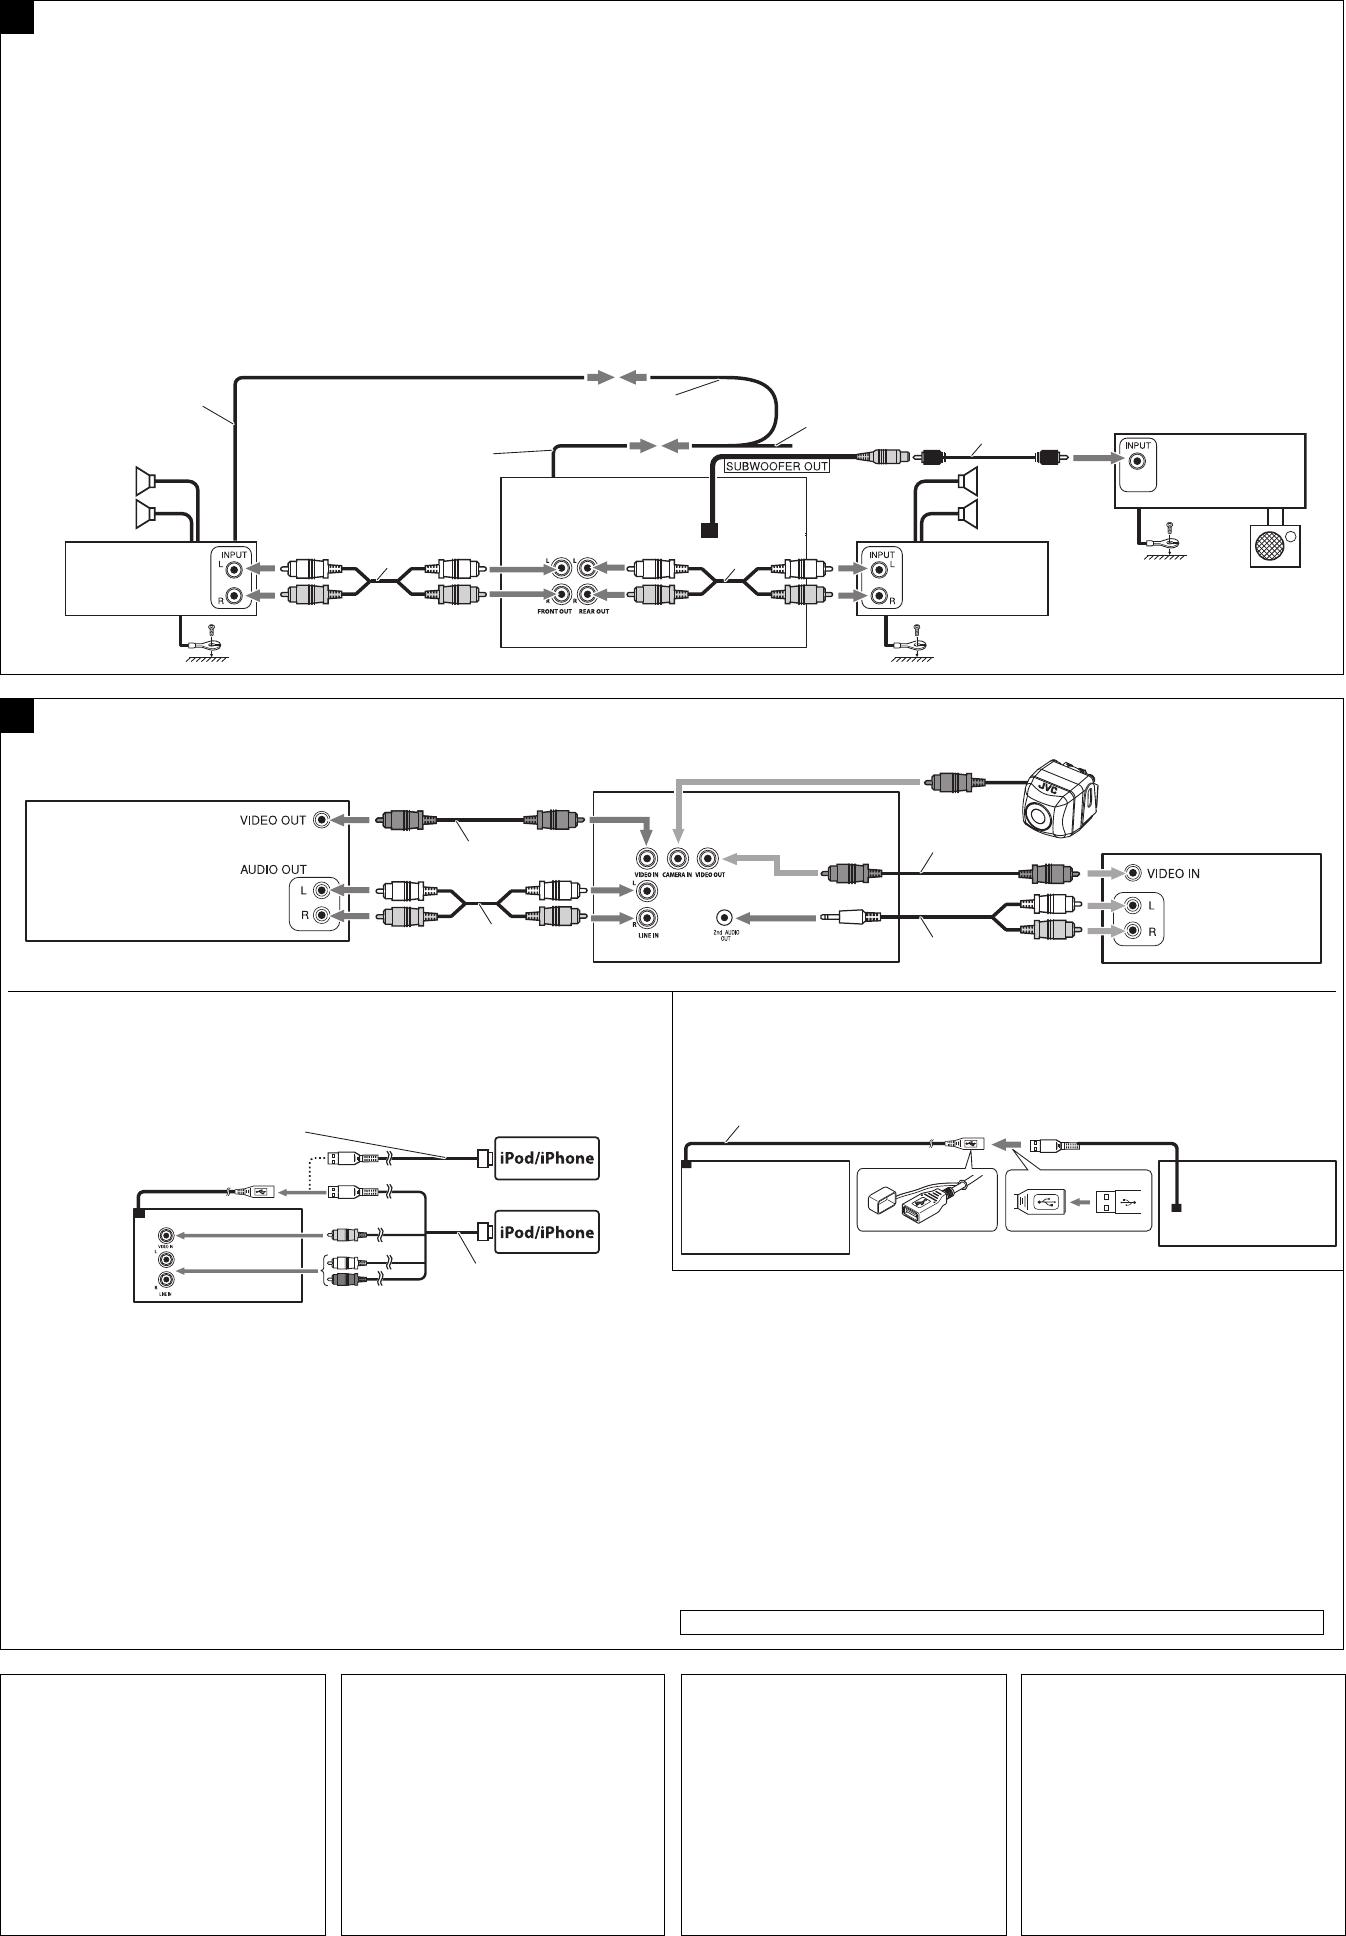 Handleiding JVC KW-AV70BT (pagina 4 van 6) (Deutsch, English ...